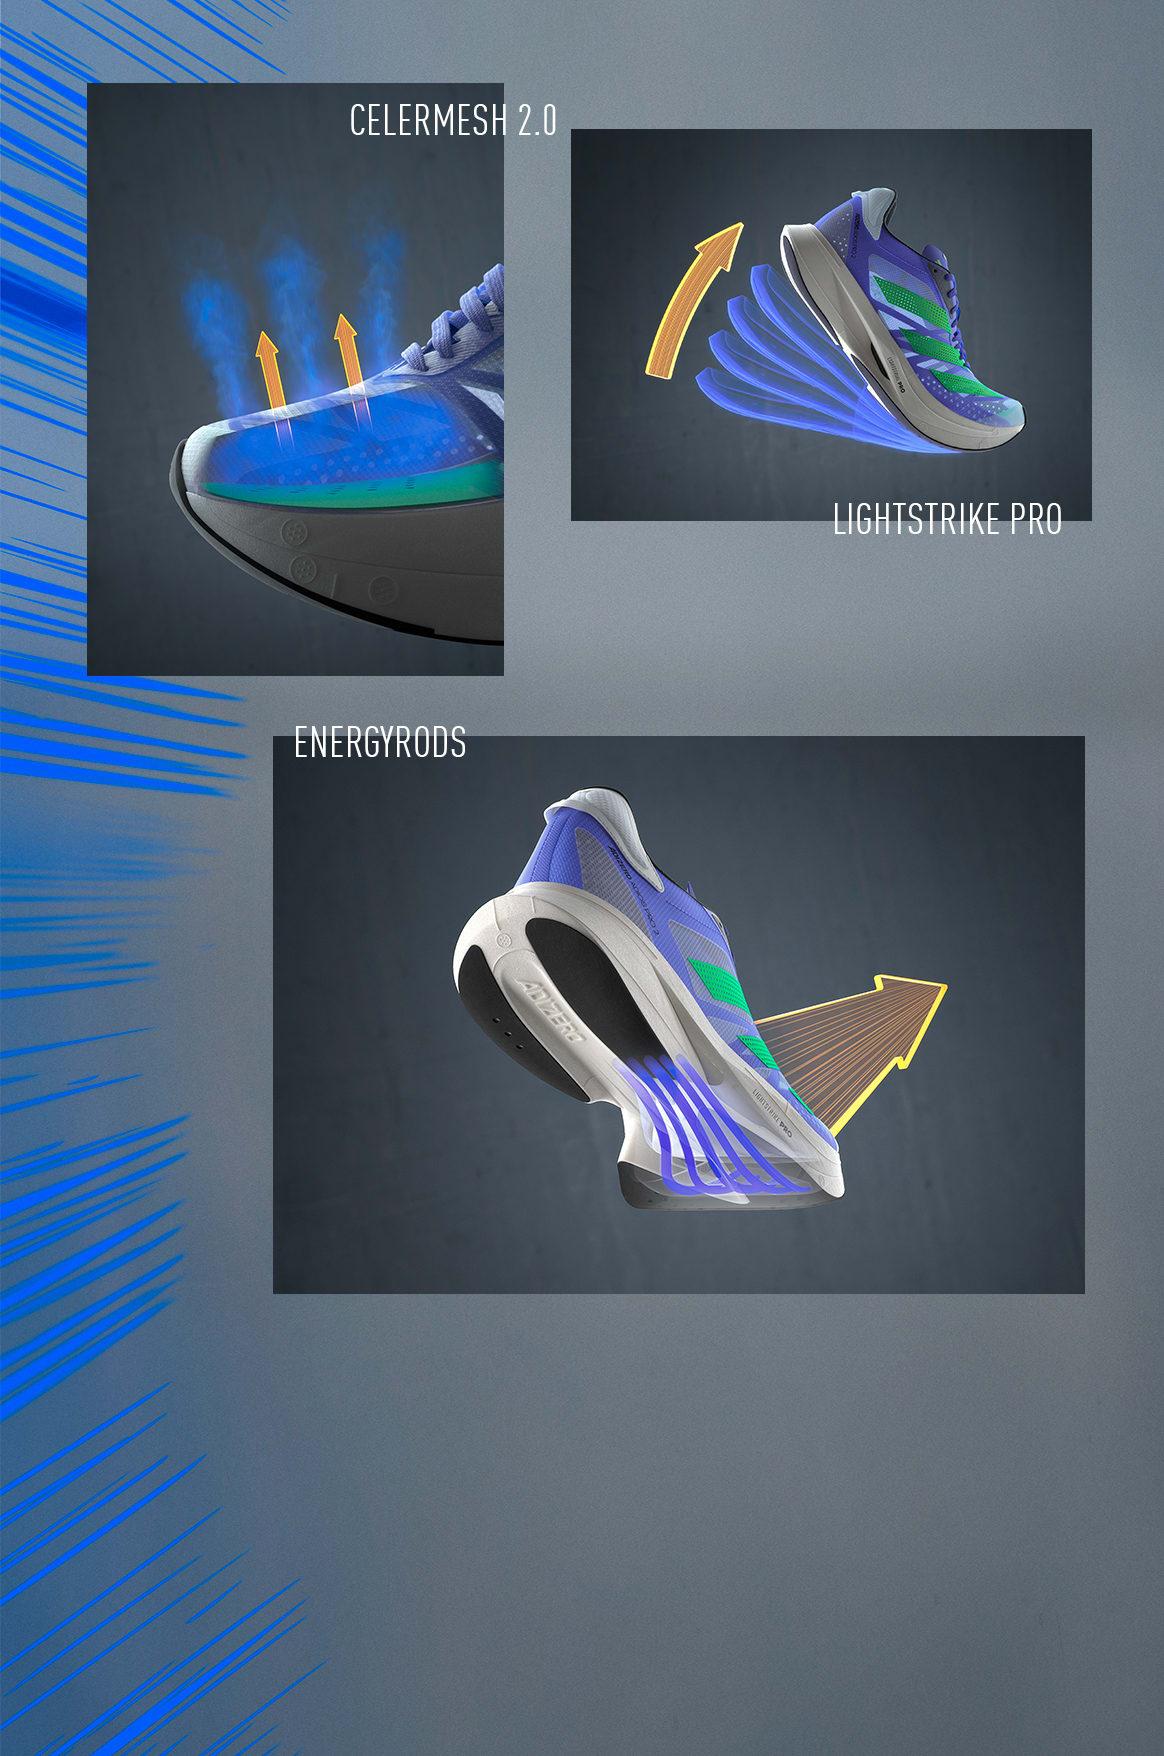 ADIOS PRO 2 product tech illustrations